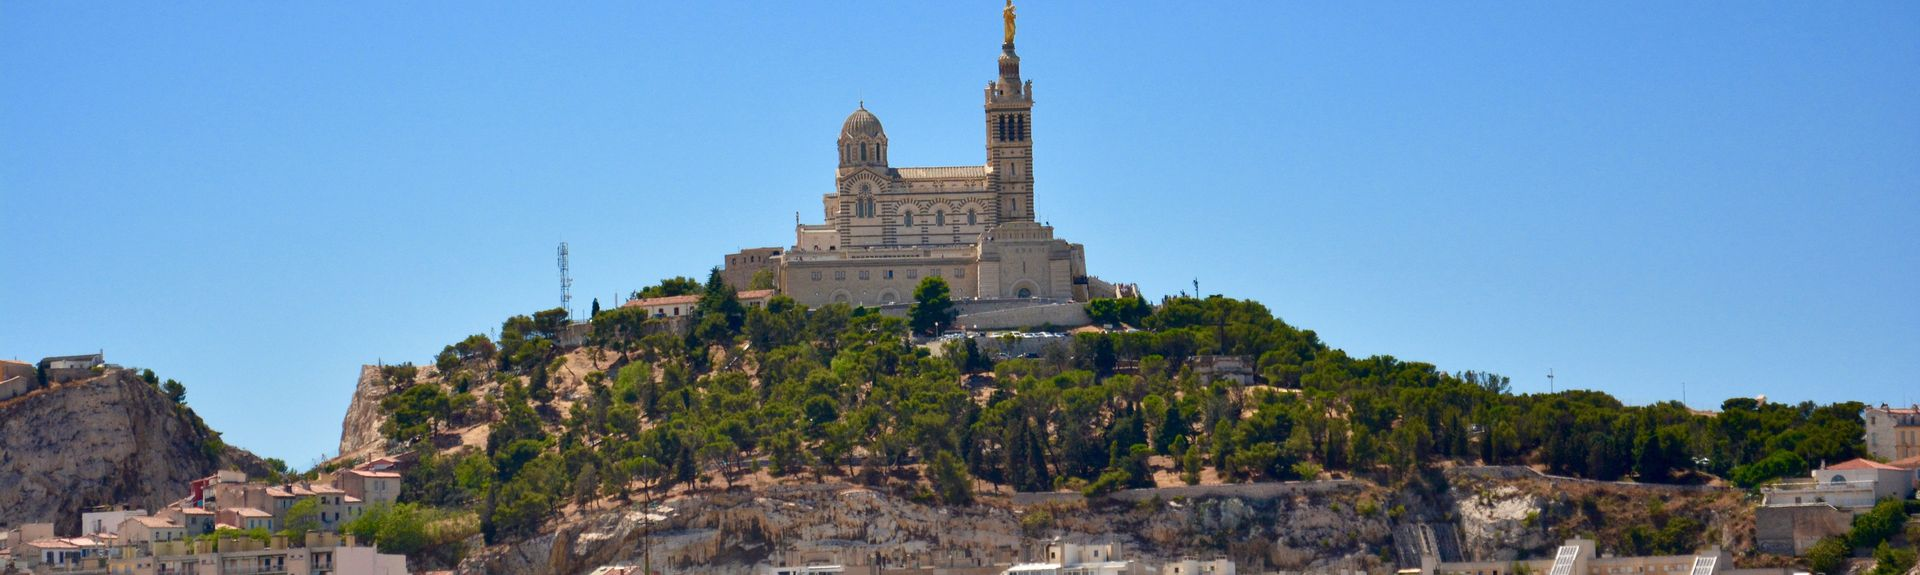 2nd Arrondissement, Marseille, Bouches-du-Rhone (department), France